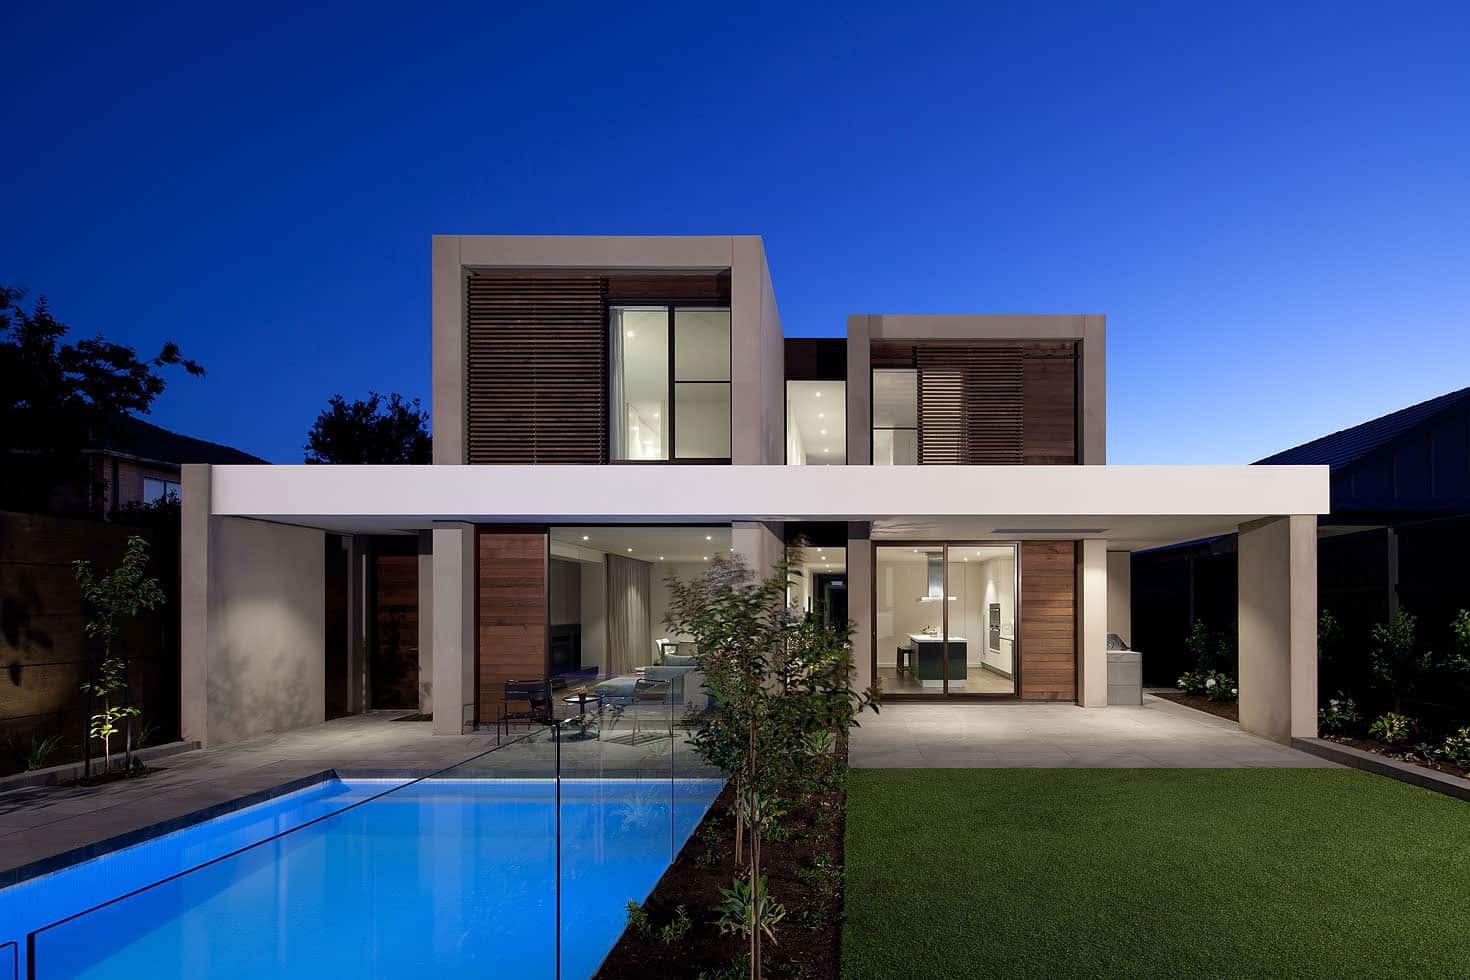 Brighton House by InForm Design - Modern Contemporary House Plans Designs Very Modern House Plans,contemperary Houses Mexzhouse.com